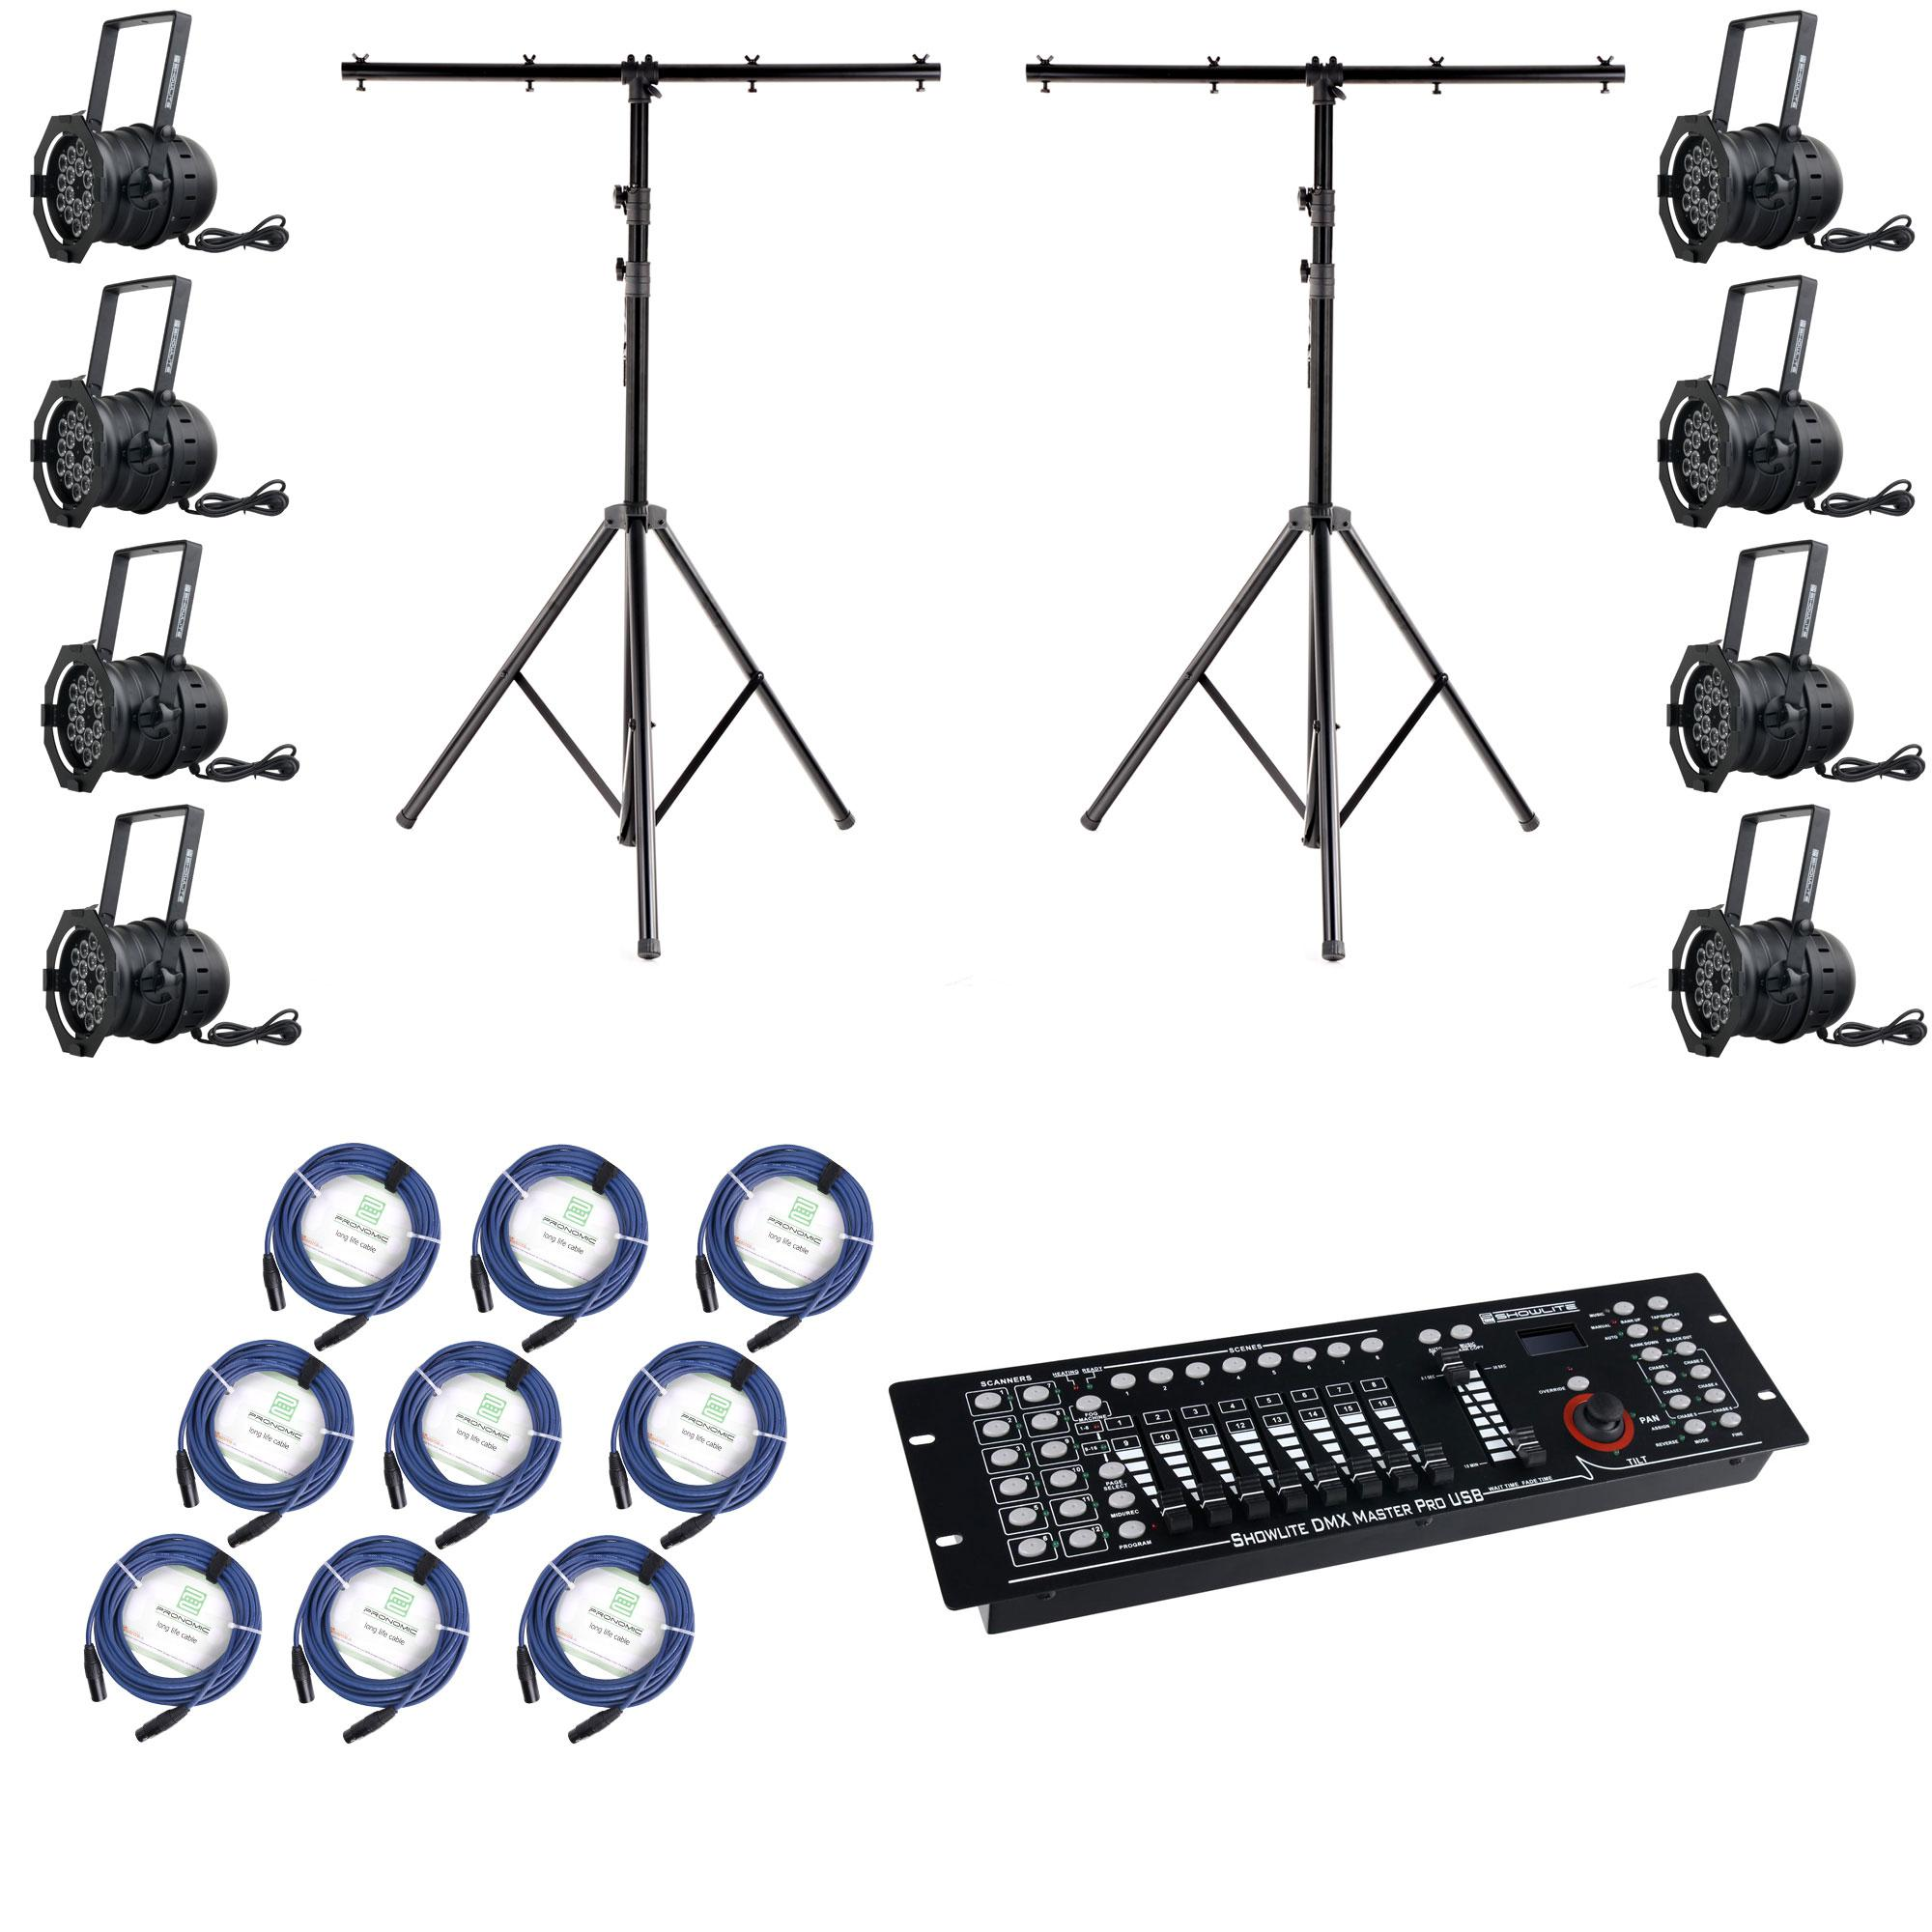 Showlite Par 64 18x8w Led Rgba Xt 25 Pro Set 8x Spotlights 2x Stativ Controller Usb Cable